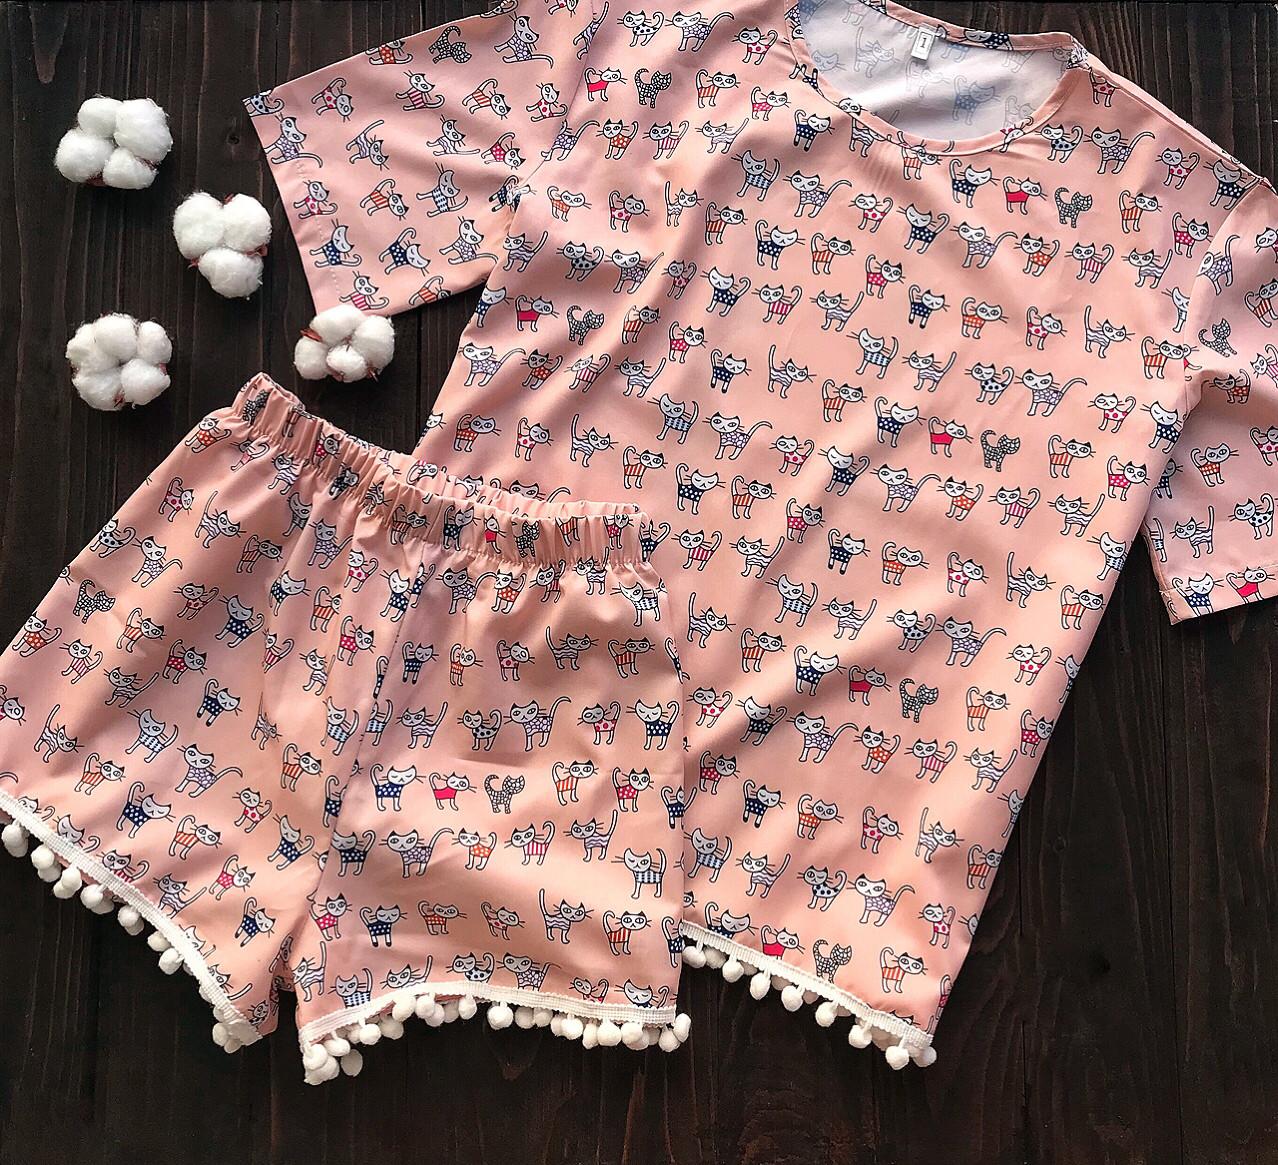 Пижама с бубонами S-M коты